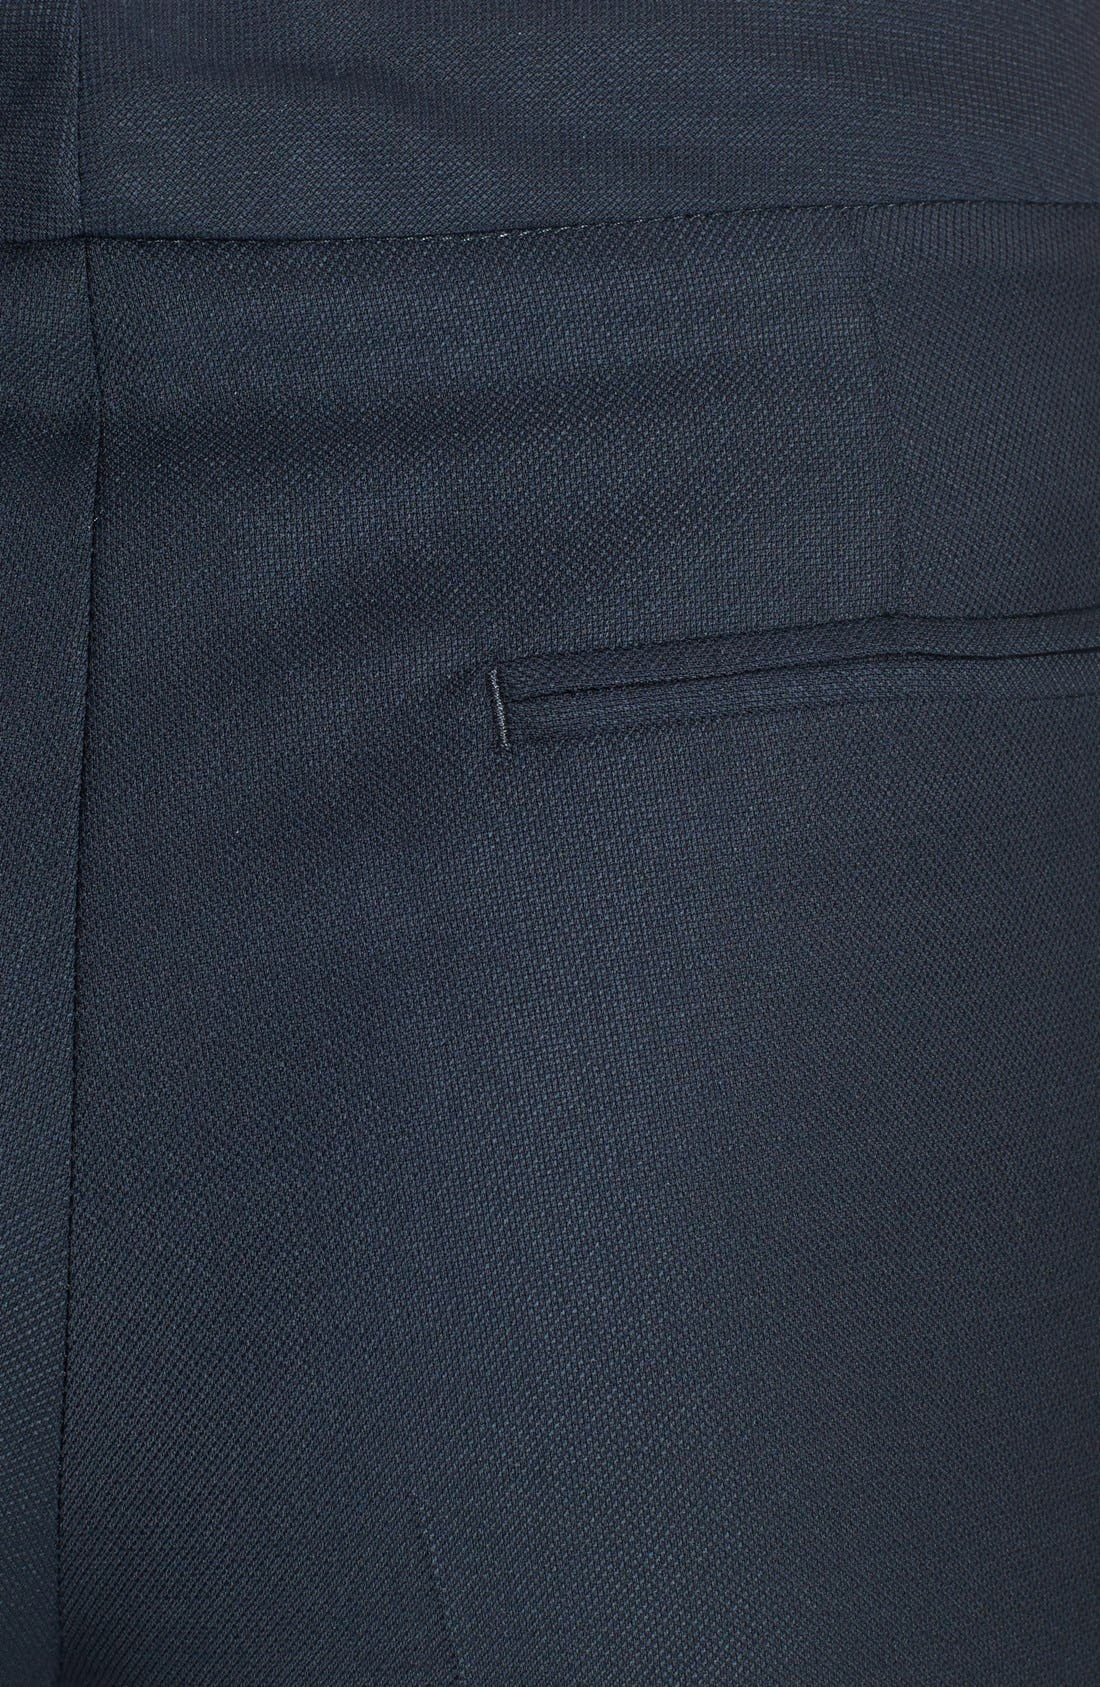 Alternate Image 3  - Santorelli Slim Leg Wool Pants